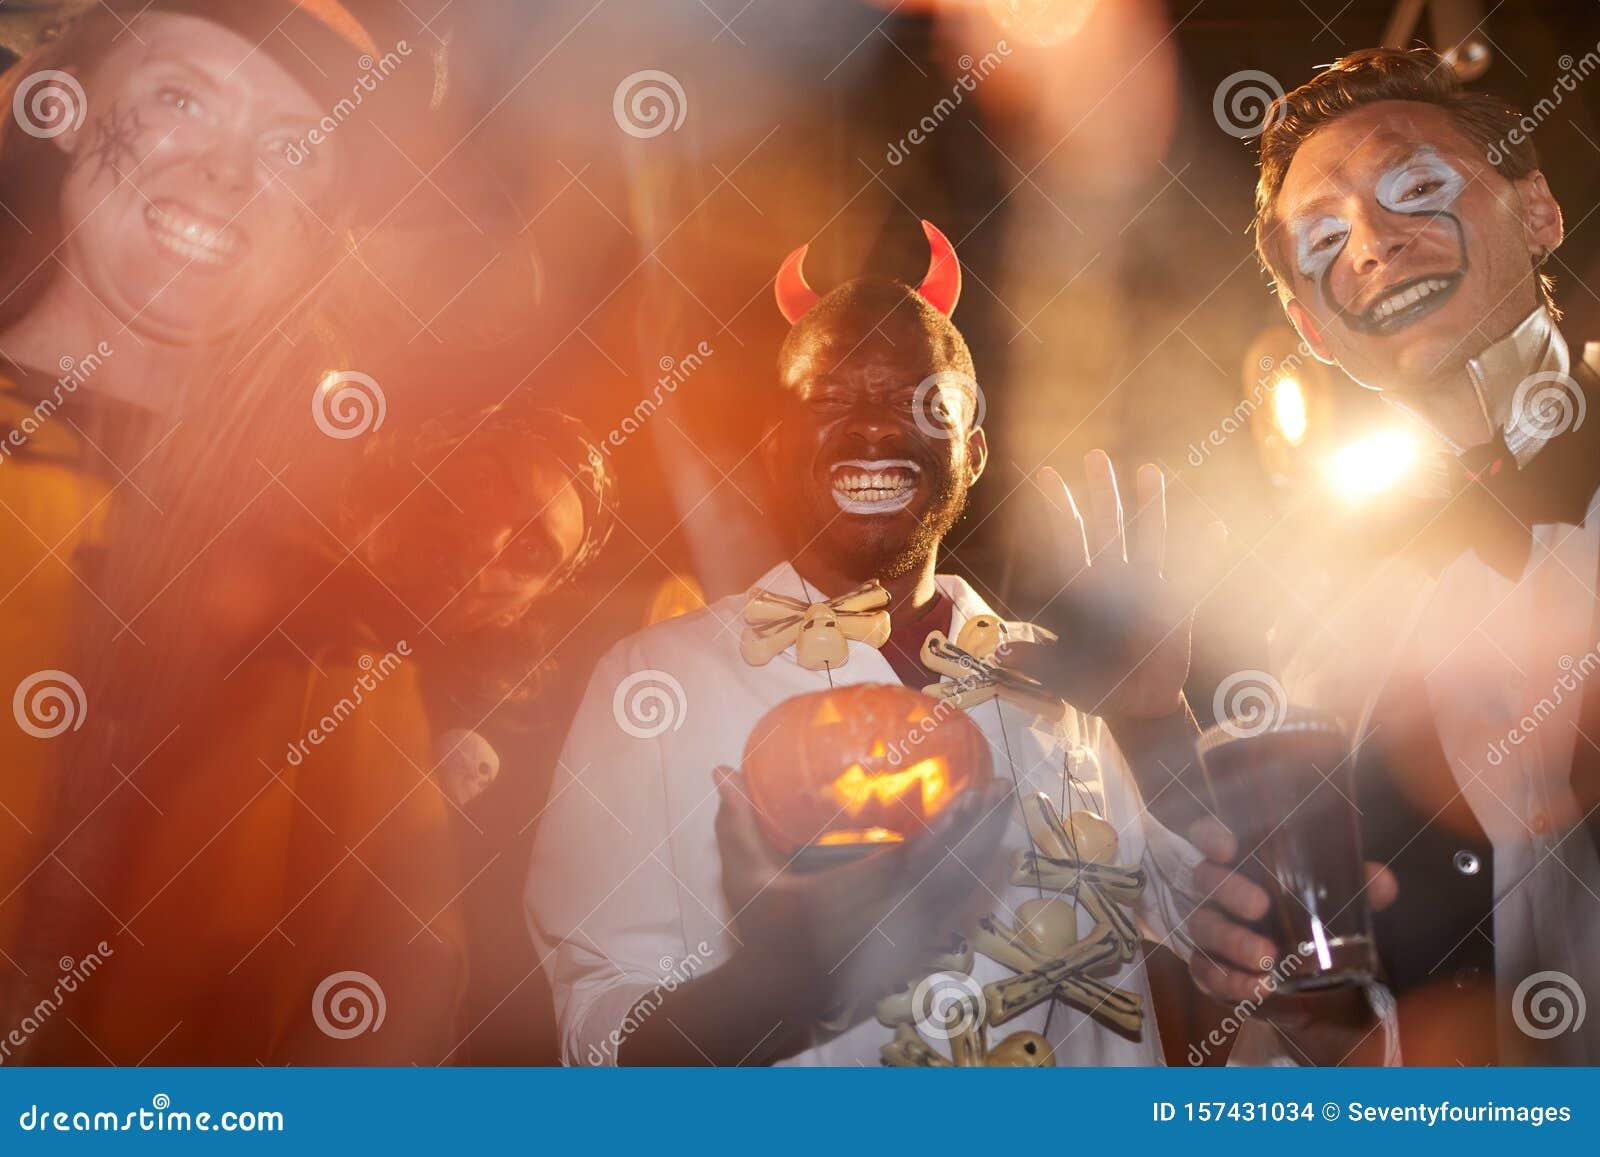 Фотографии мужчин в ночных клубах бар ресторан москва клуб